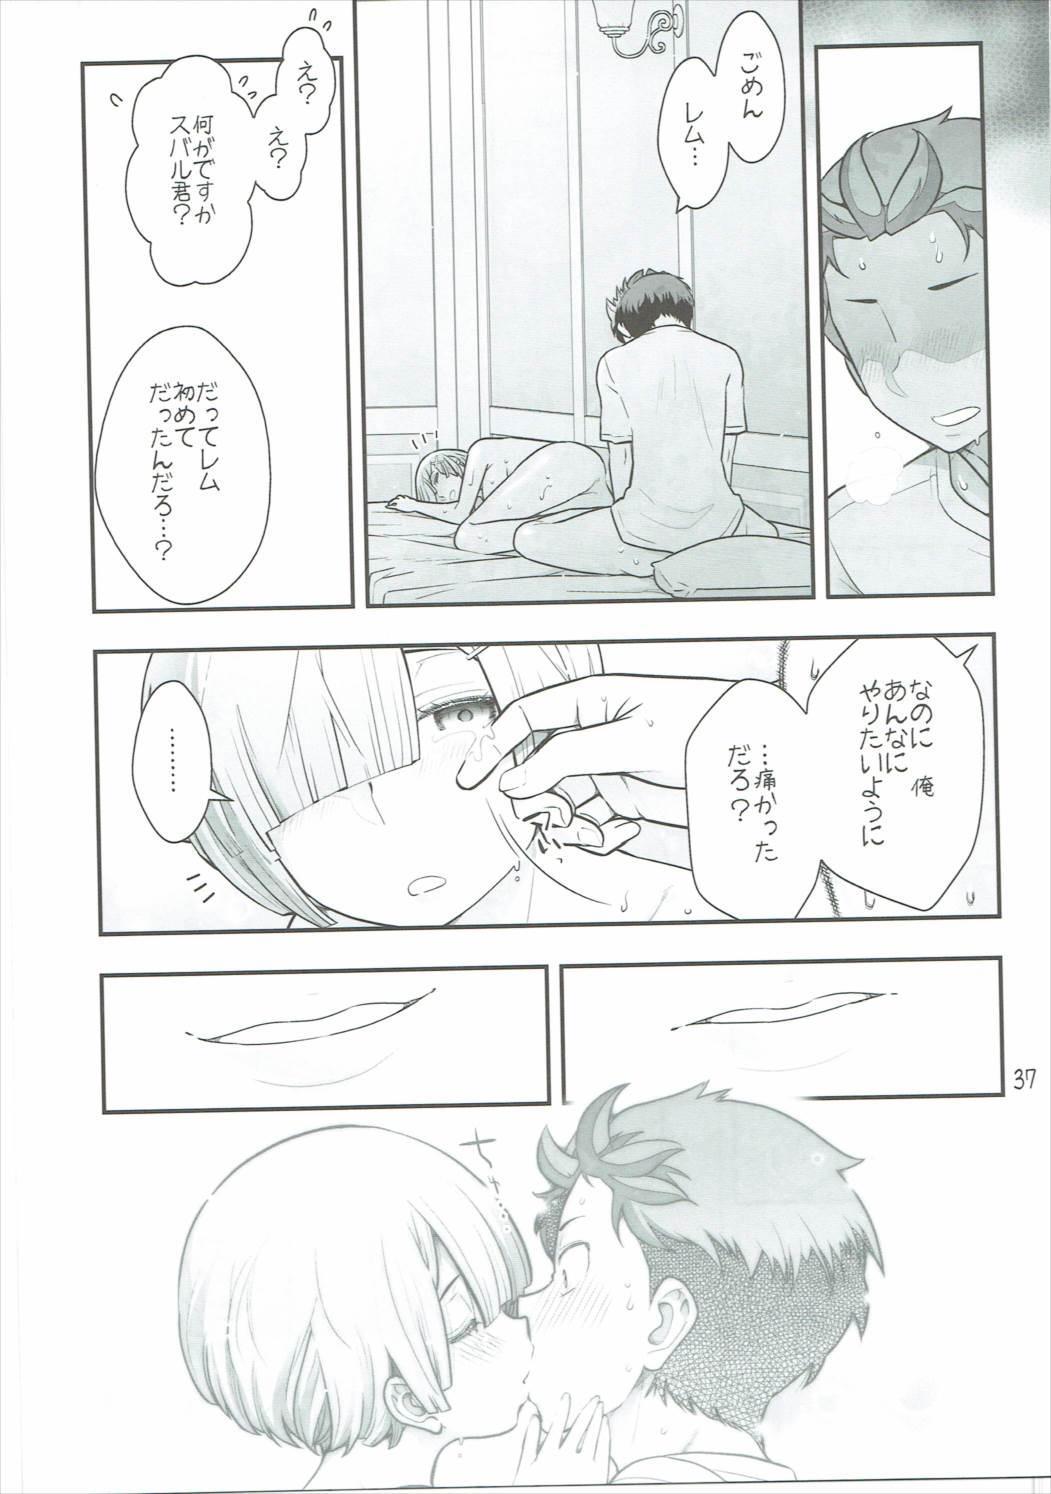 RMH Rem-san maji ecchi 37